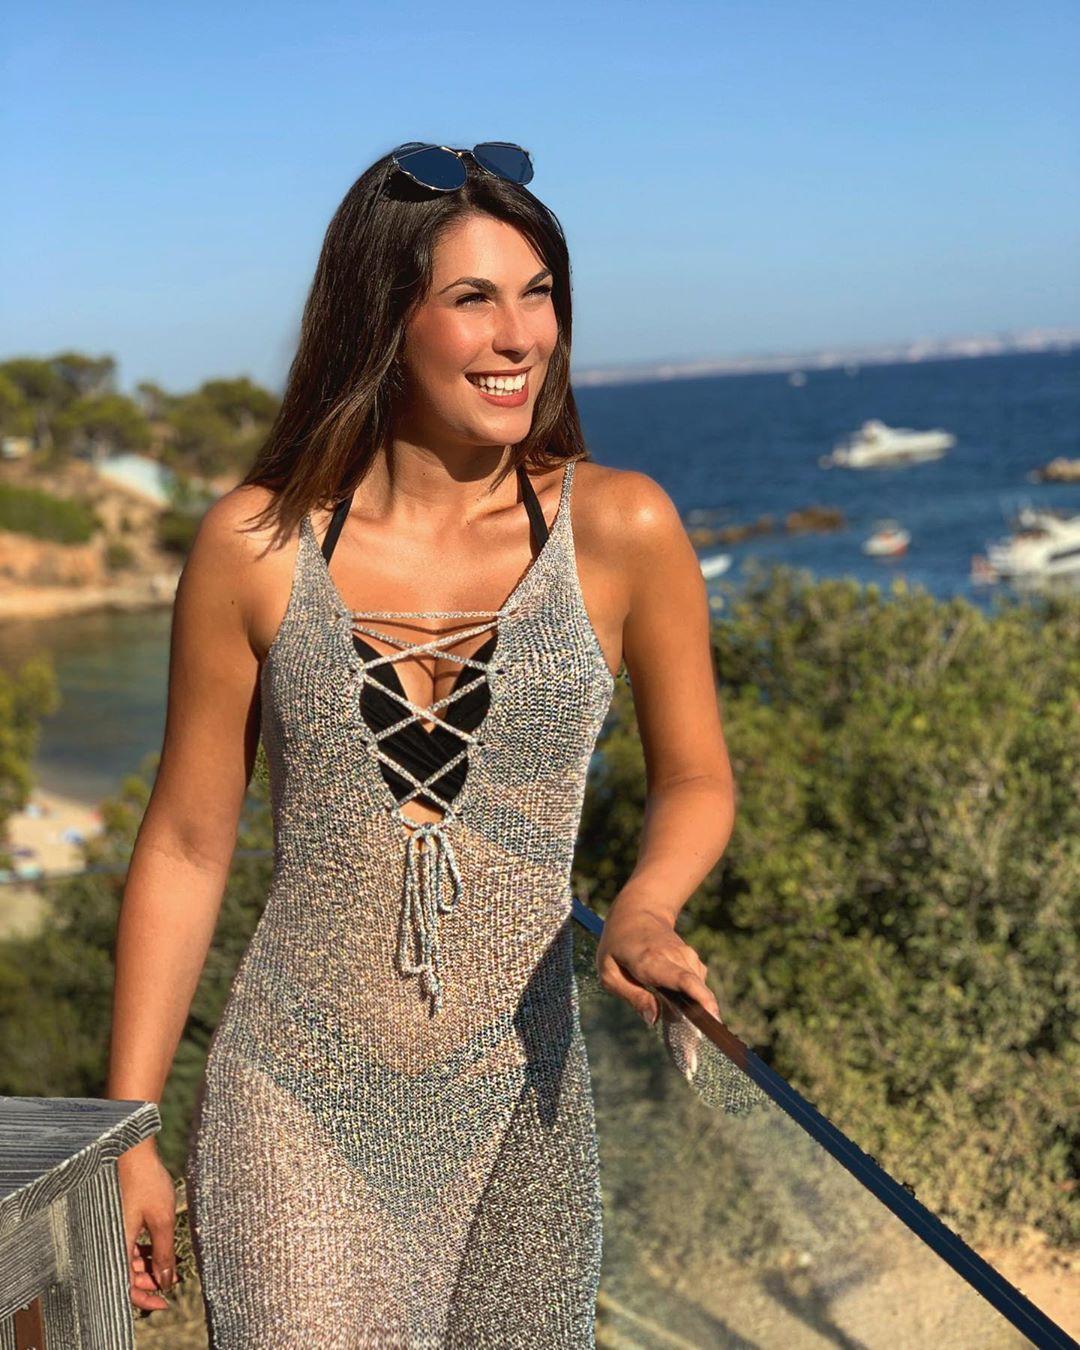 Stefanie Capshield dress swimwear colour outfit, best photoshoot ideas